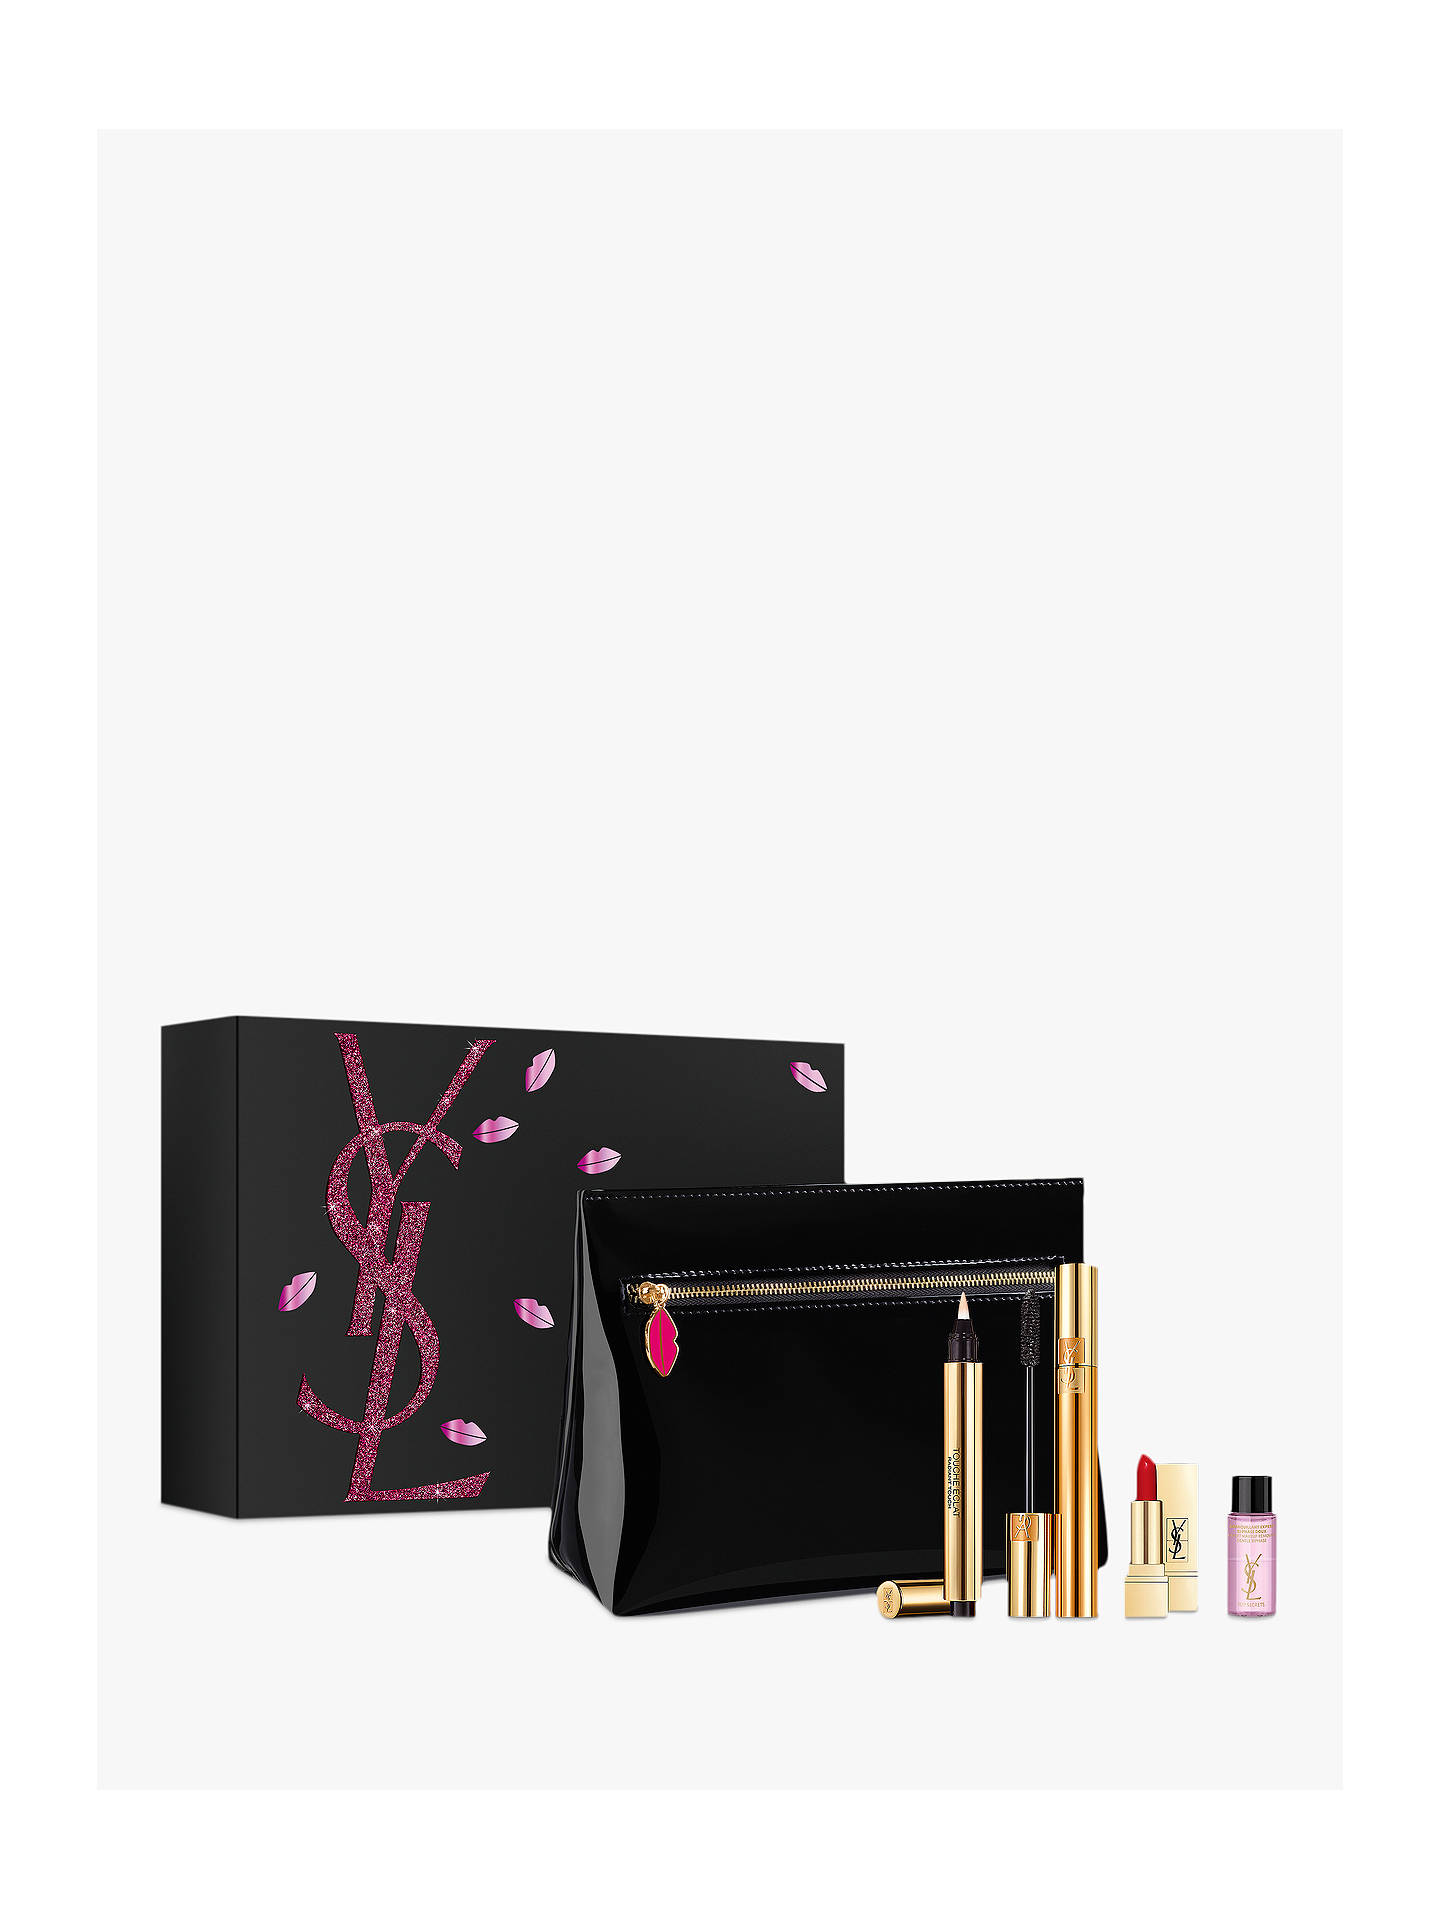 c310702862d2 Buy Yves Saint Laurent Must Haves Makeup Gift Set Online at johnlewis.com